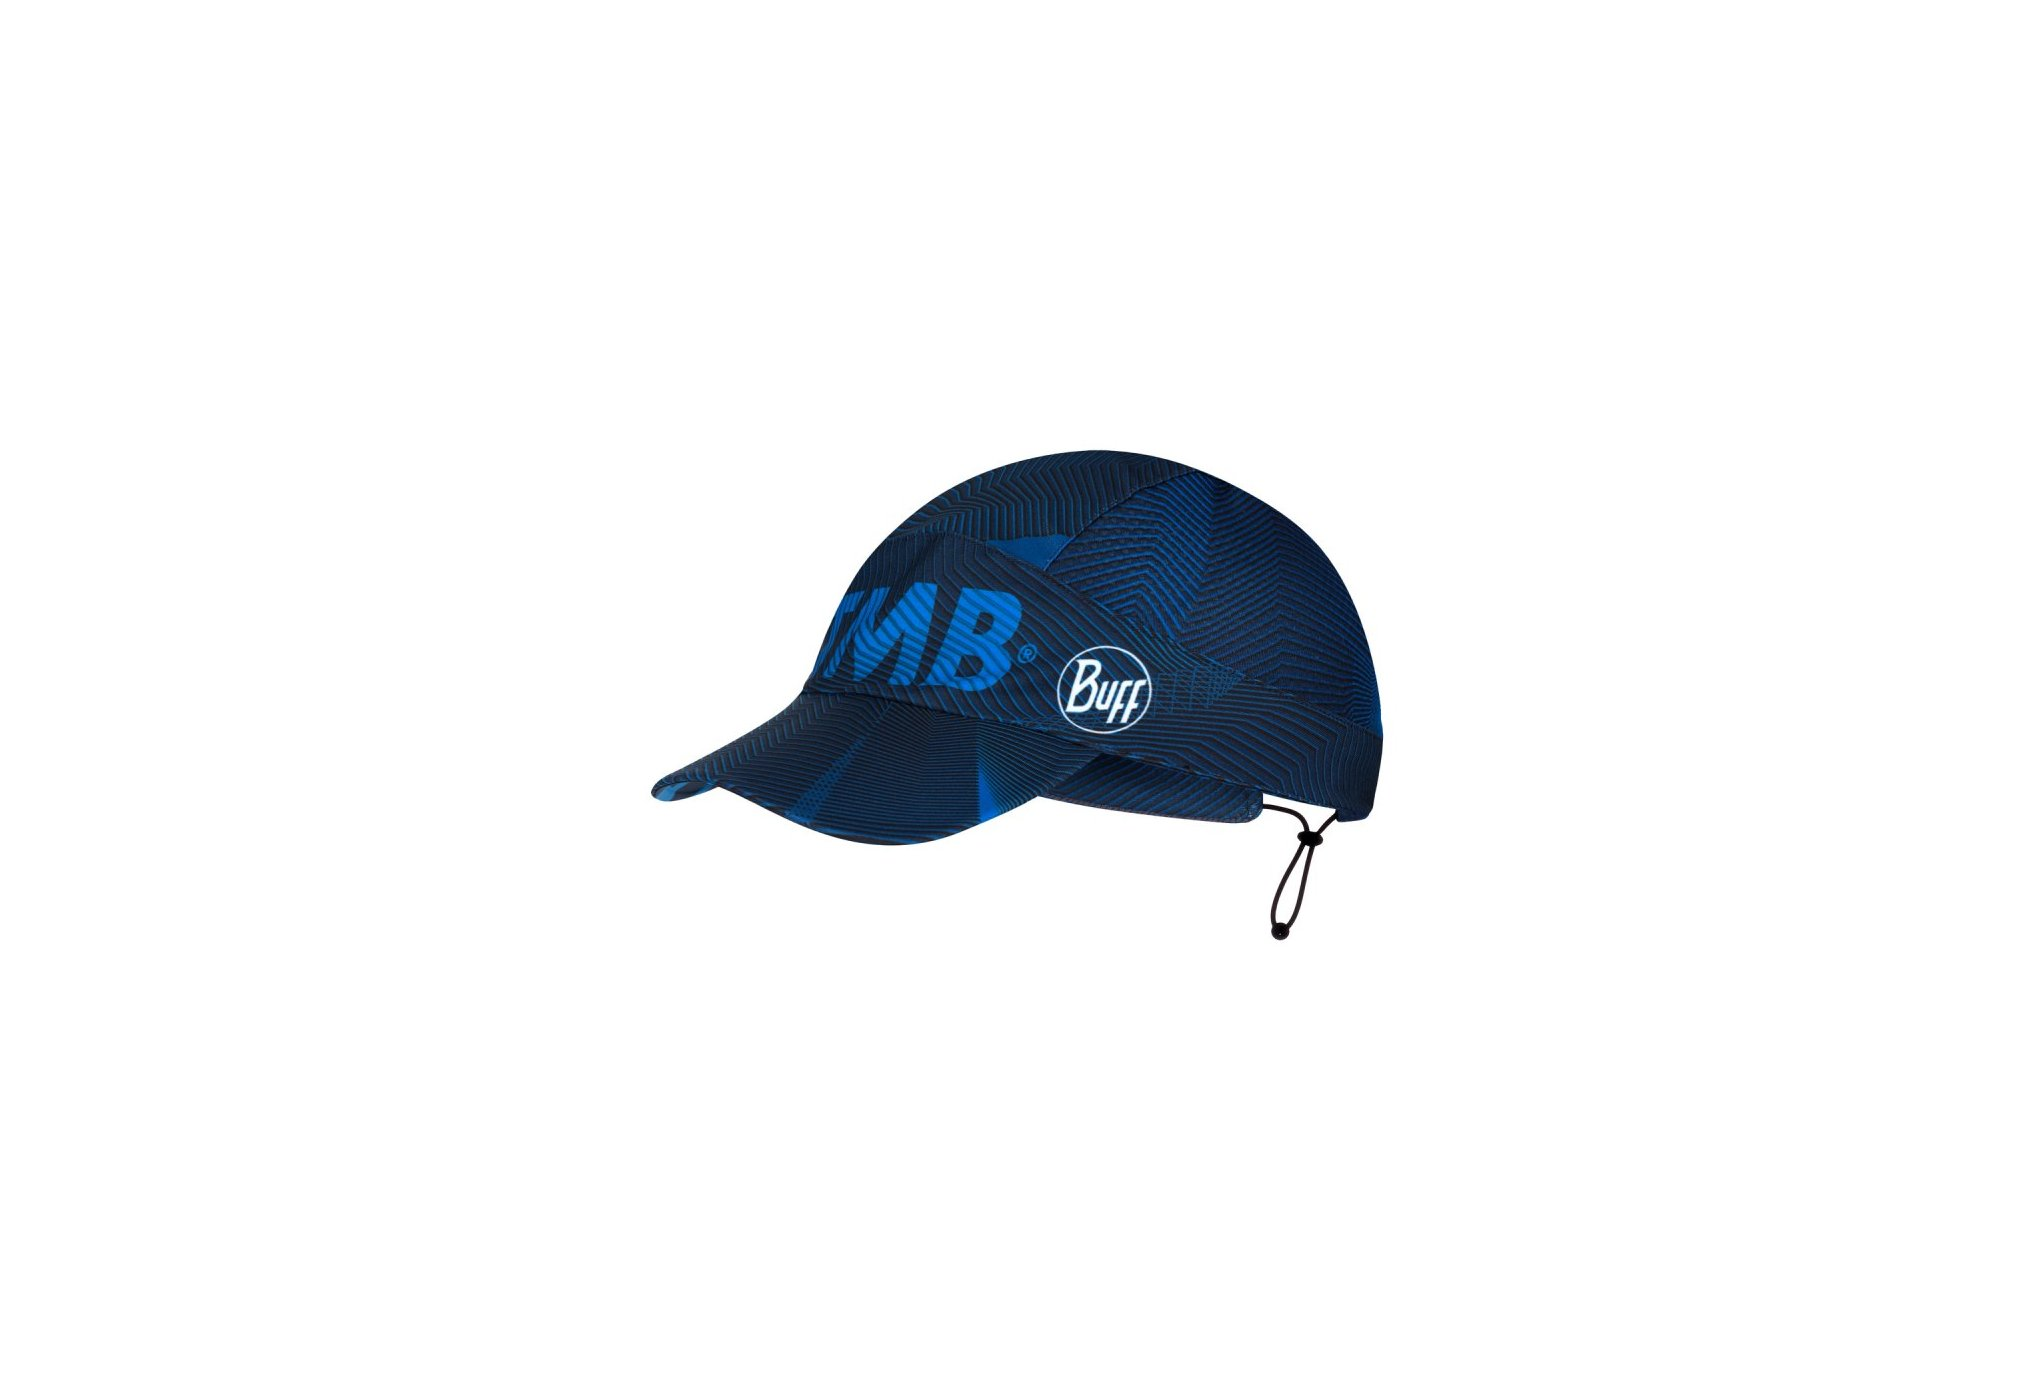 Buff Pack Run Cap UTMB 2020 Casquettes / bandeaux